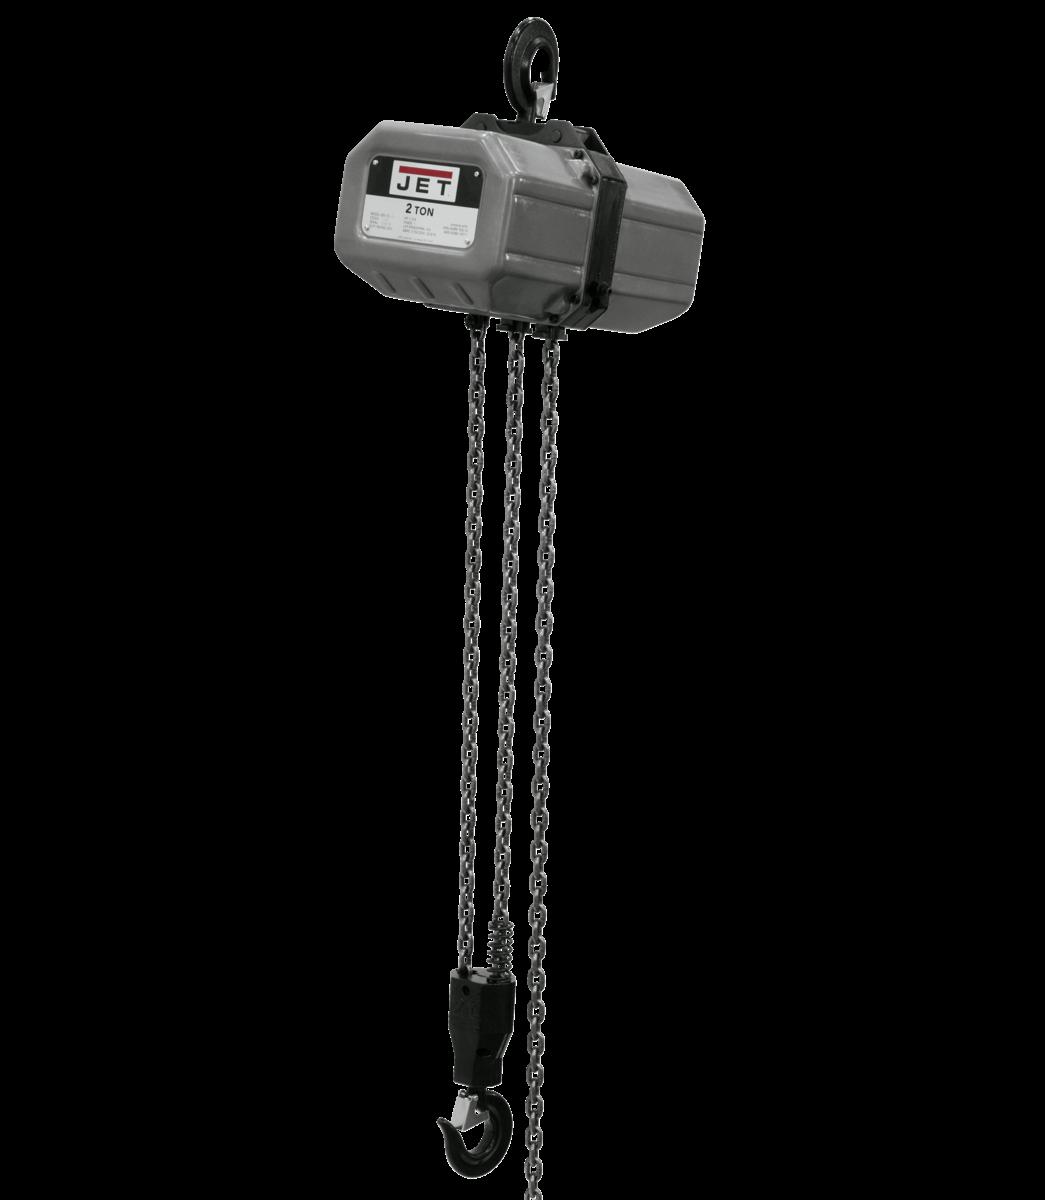 2SS-3C-15, 2-Ton Electric Chain Hoist 3-Phase 15' Lift